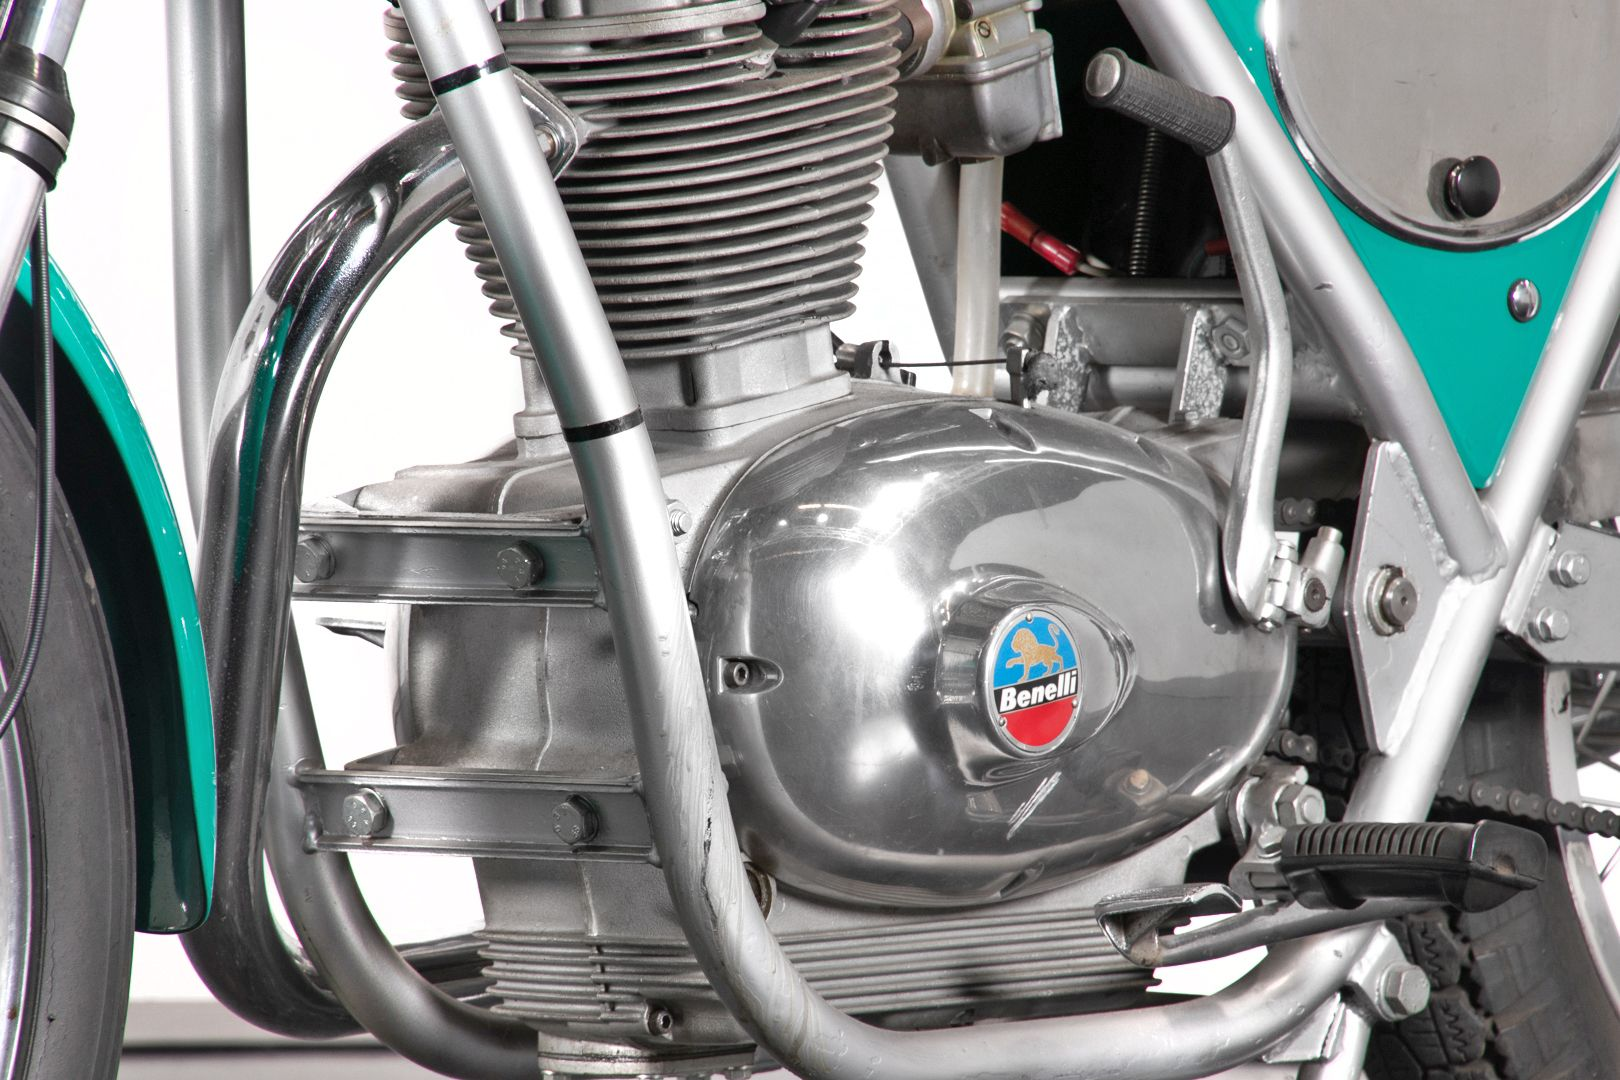 1968 Benelli 175 Reverside 74388